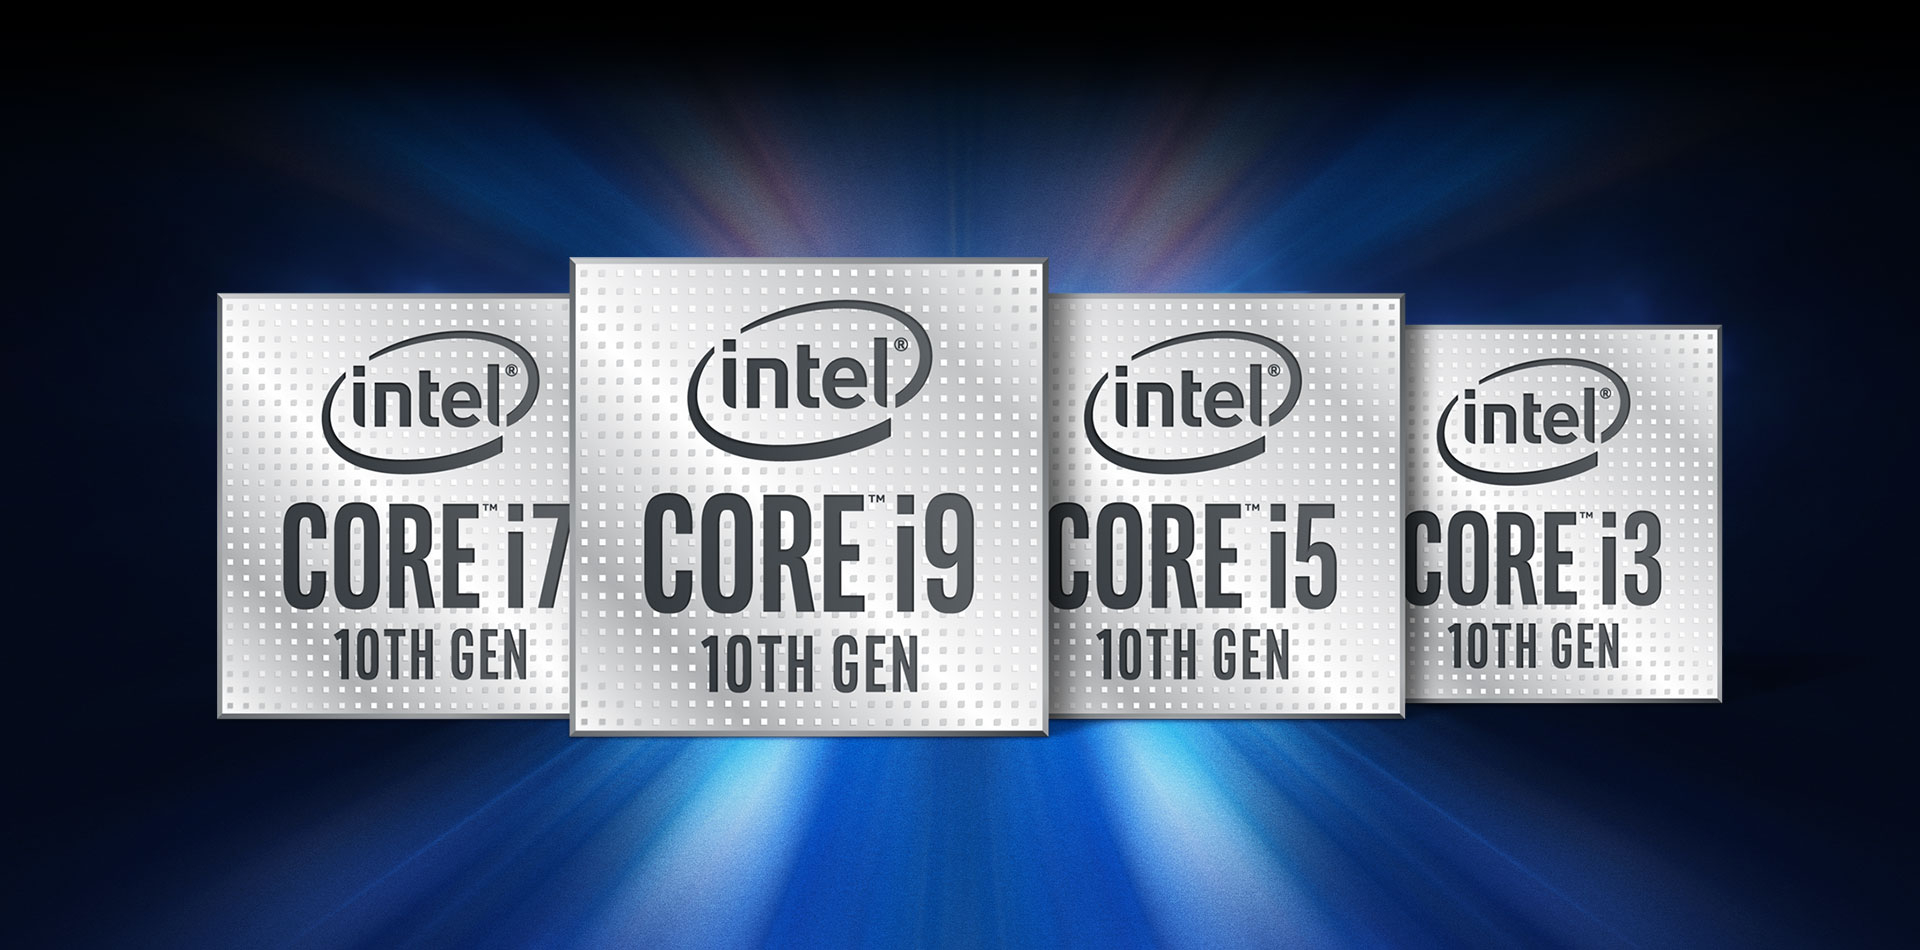 Intel Core I9 10900Kf 10-Core Lga 1200 3.70Ghz Unlocked Cpu Processor with Blank I9 2021